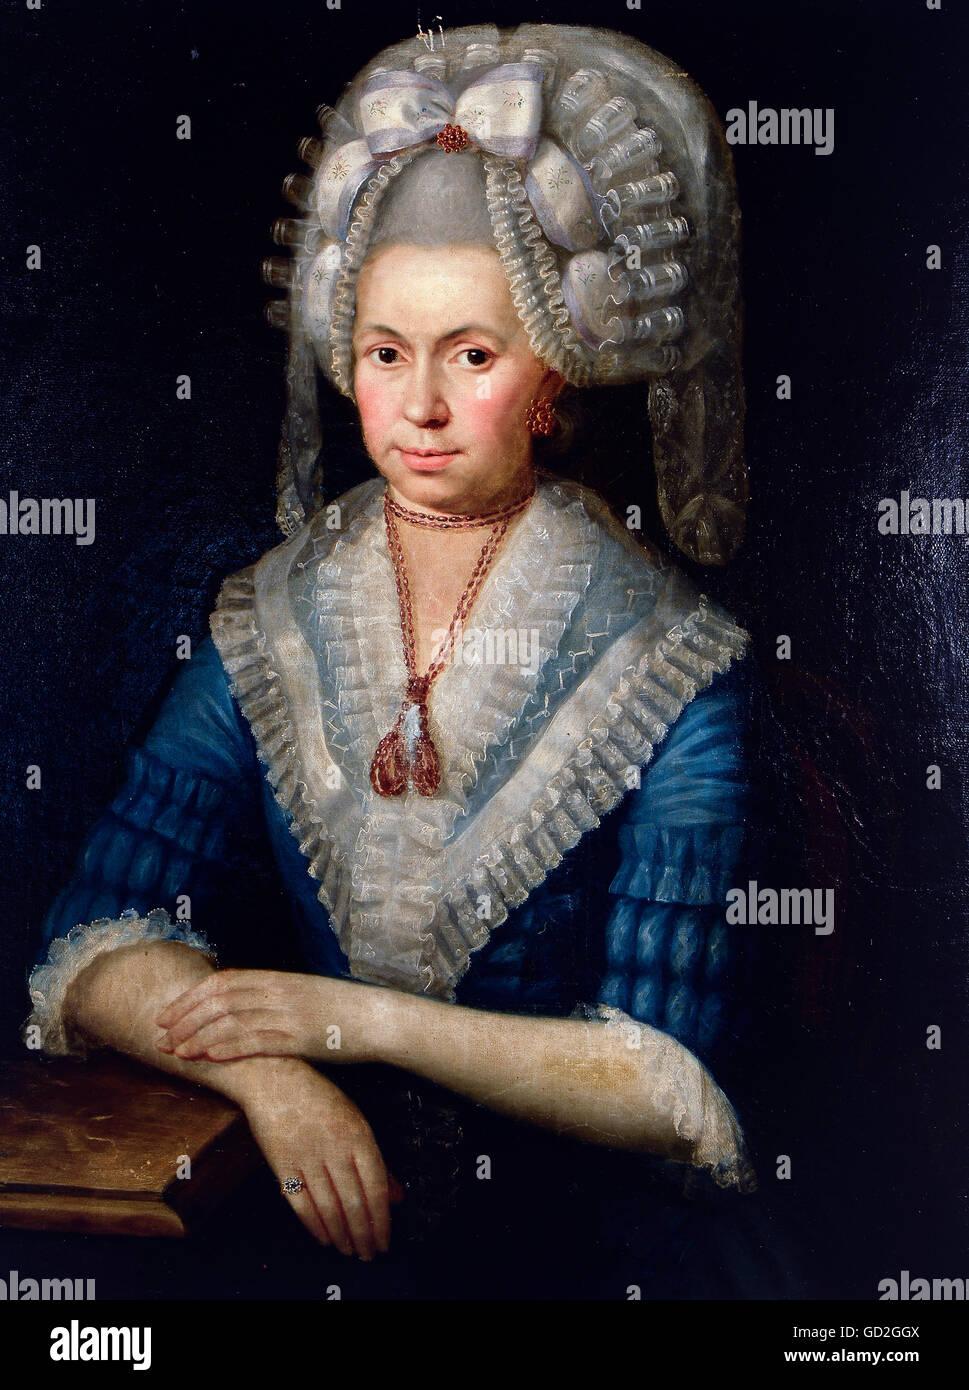 18th Century Woman Wig Stock Photos   18th Century Woman Wig Stock ... 07aa220782